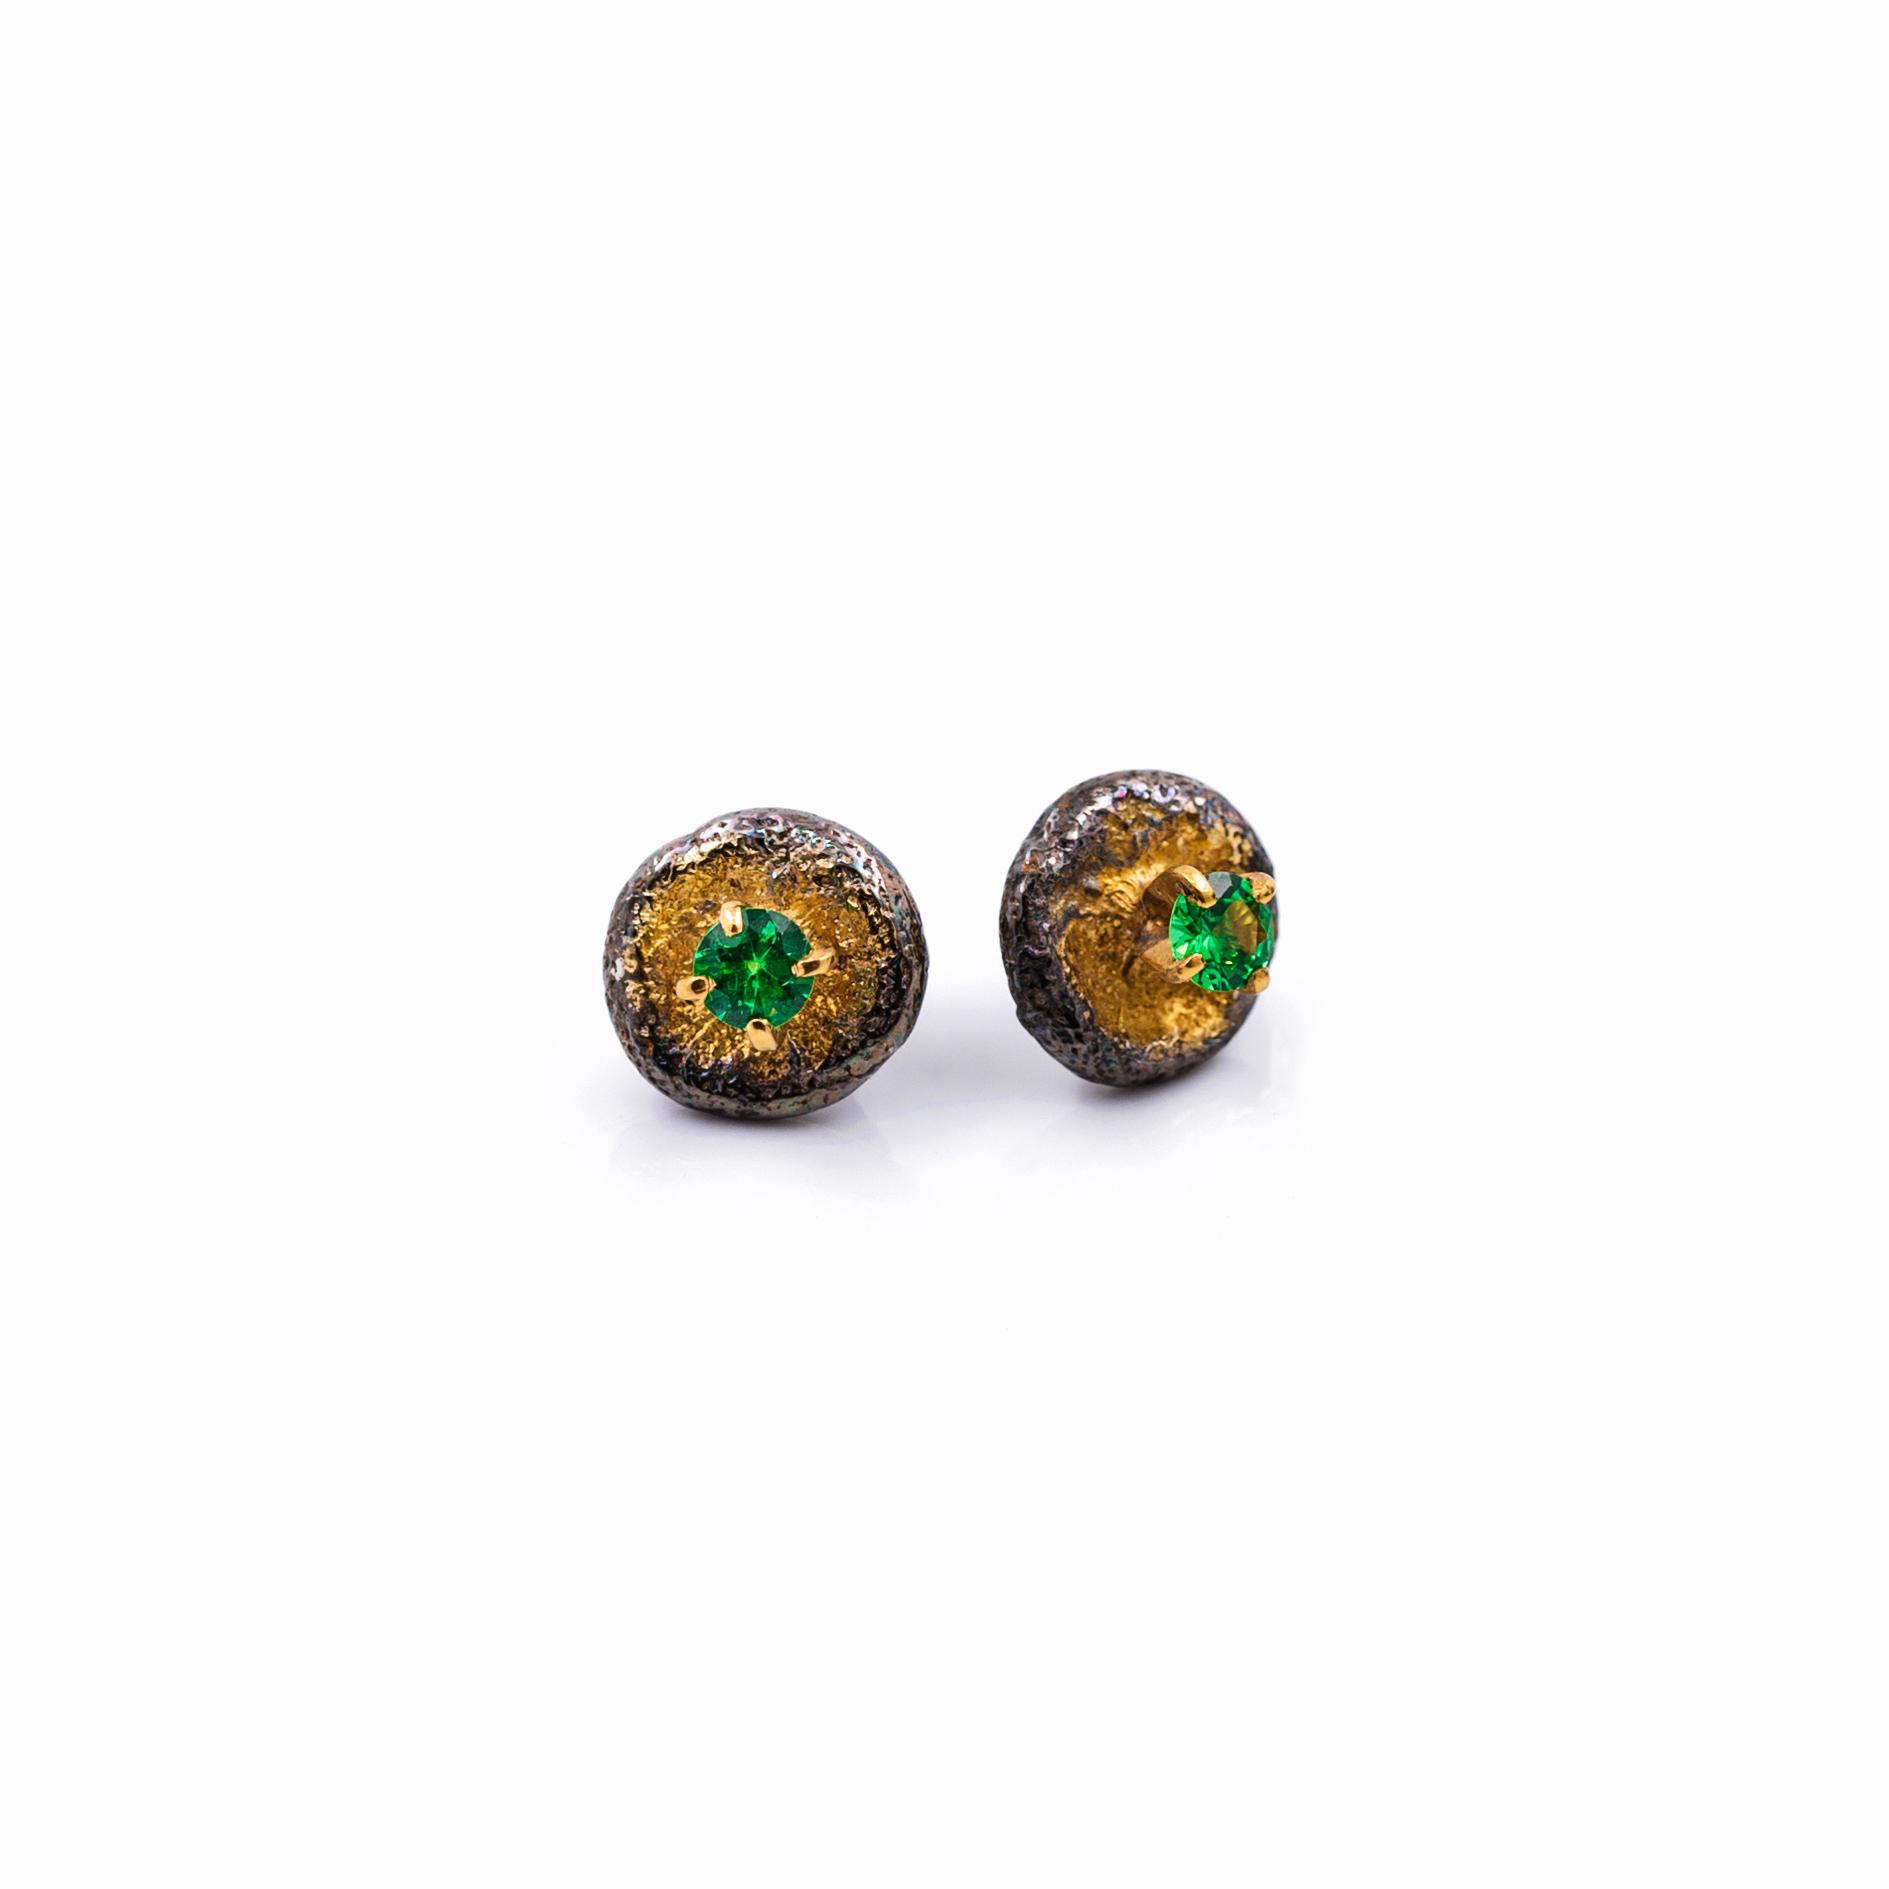 Bouton Earrings: Sterling silver, tsavorite, gold vermeil, patina.